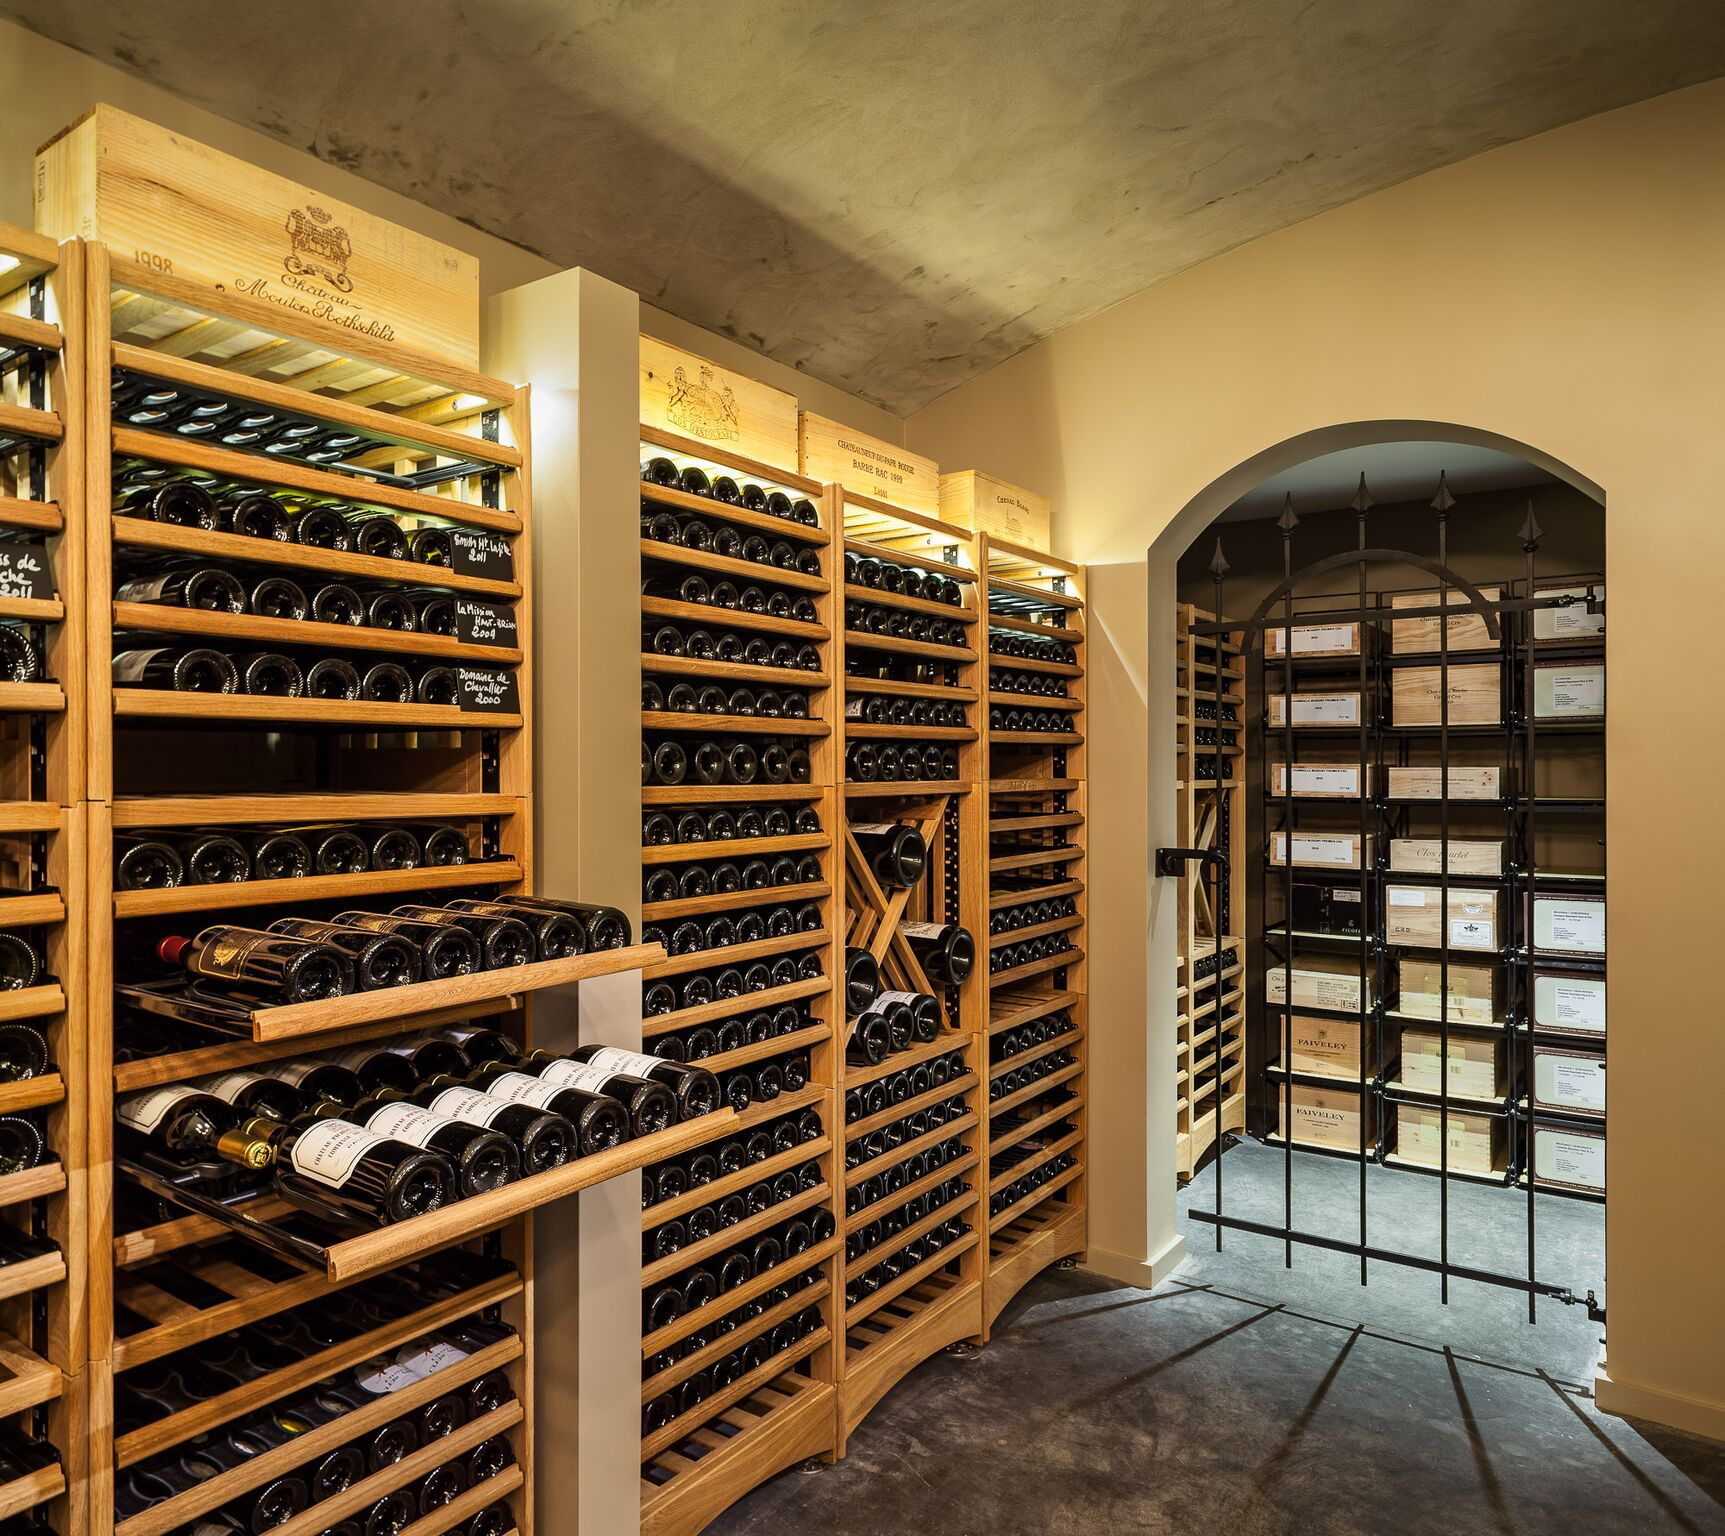 wine cellar callender howorth